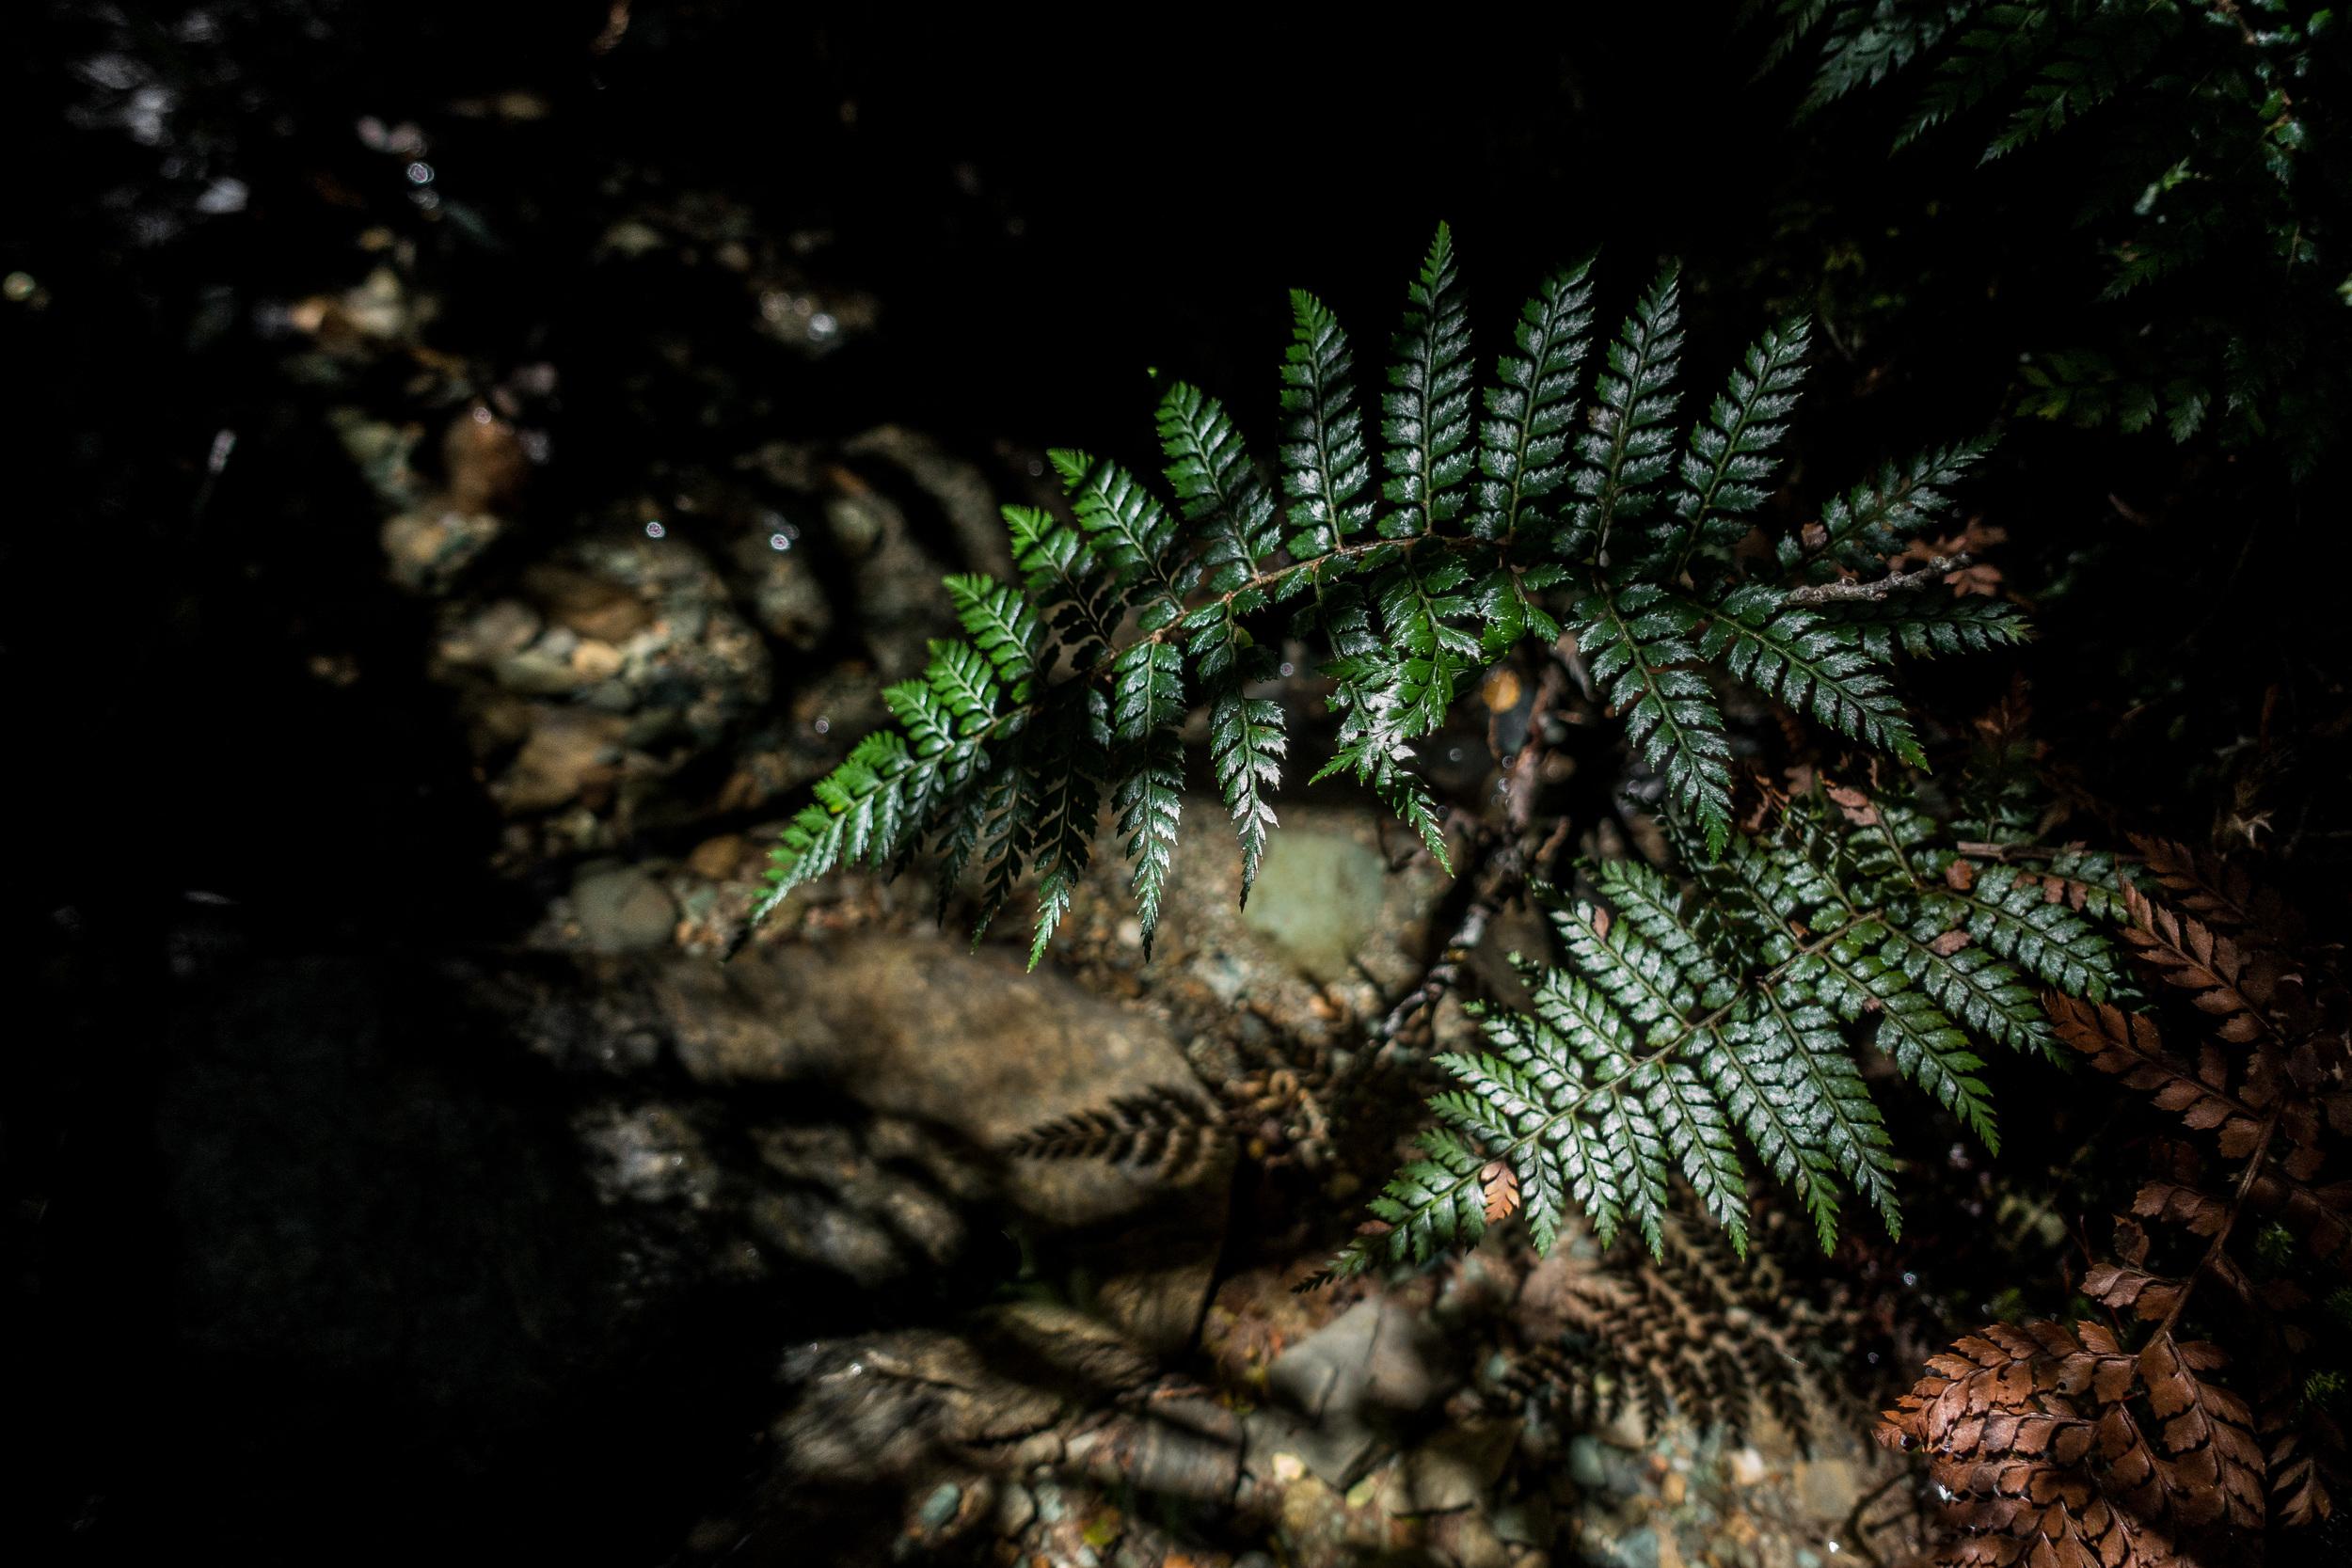 NEW ZEALAND - ROUTEBURN TRACK